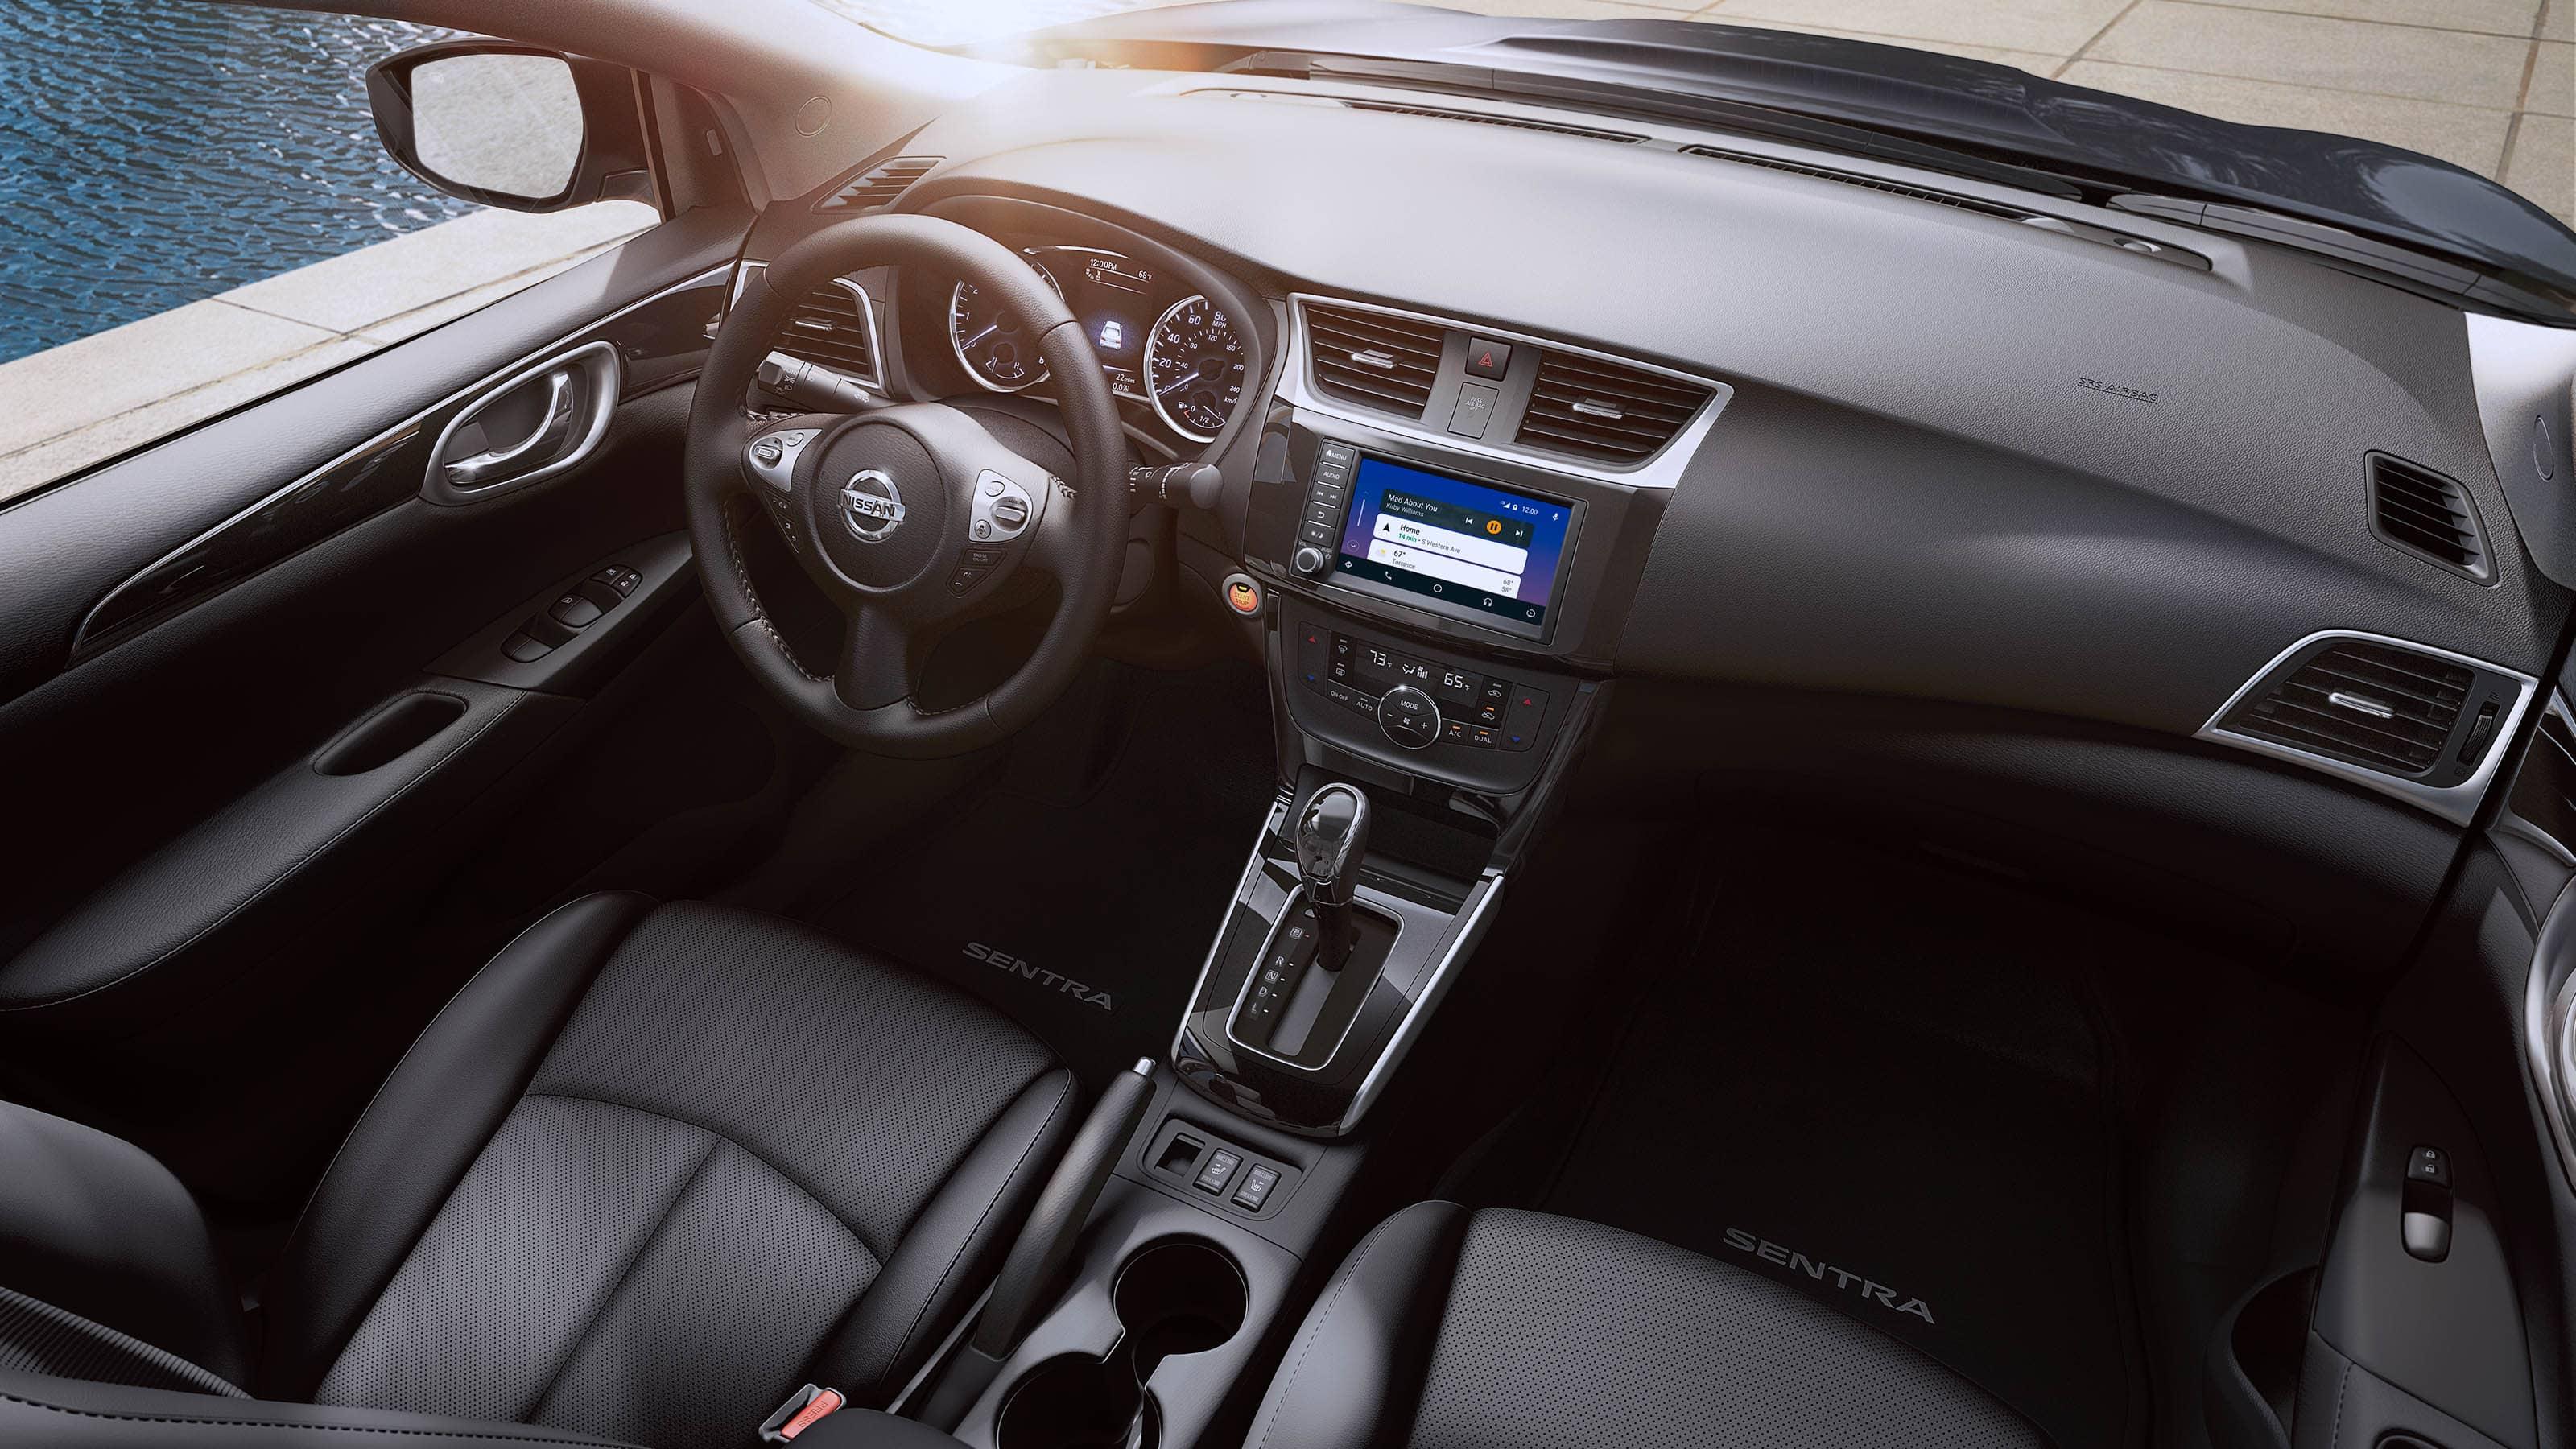 2019 Nissan Sentra Dashboard